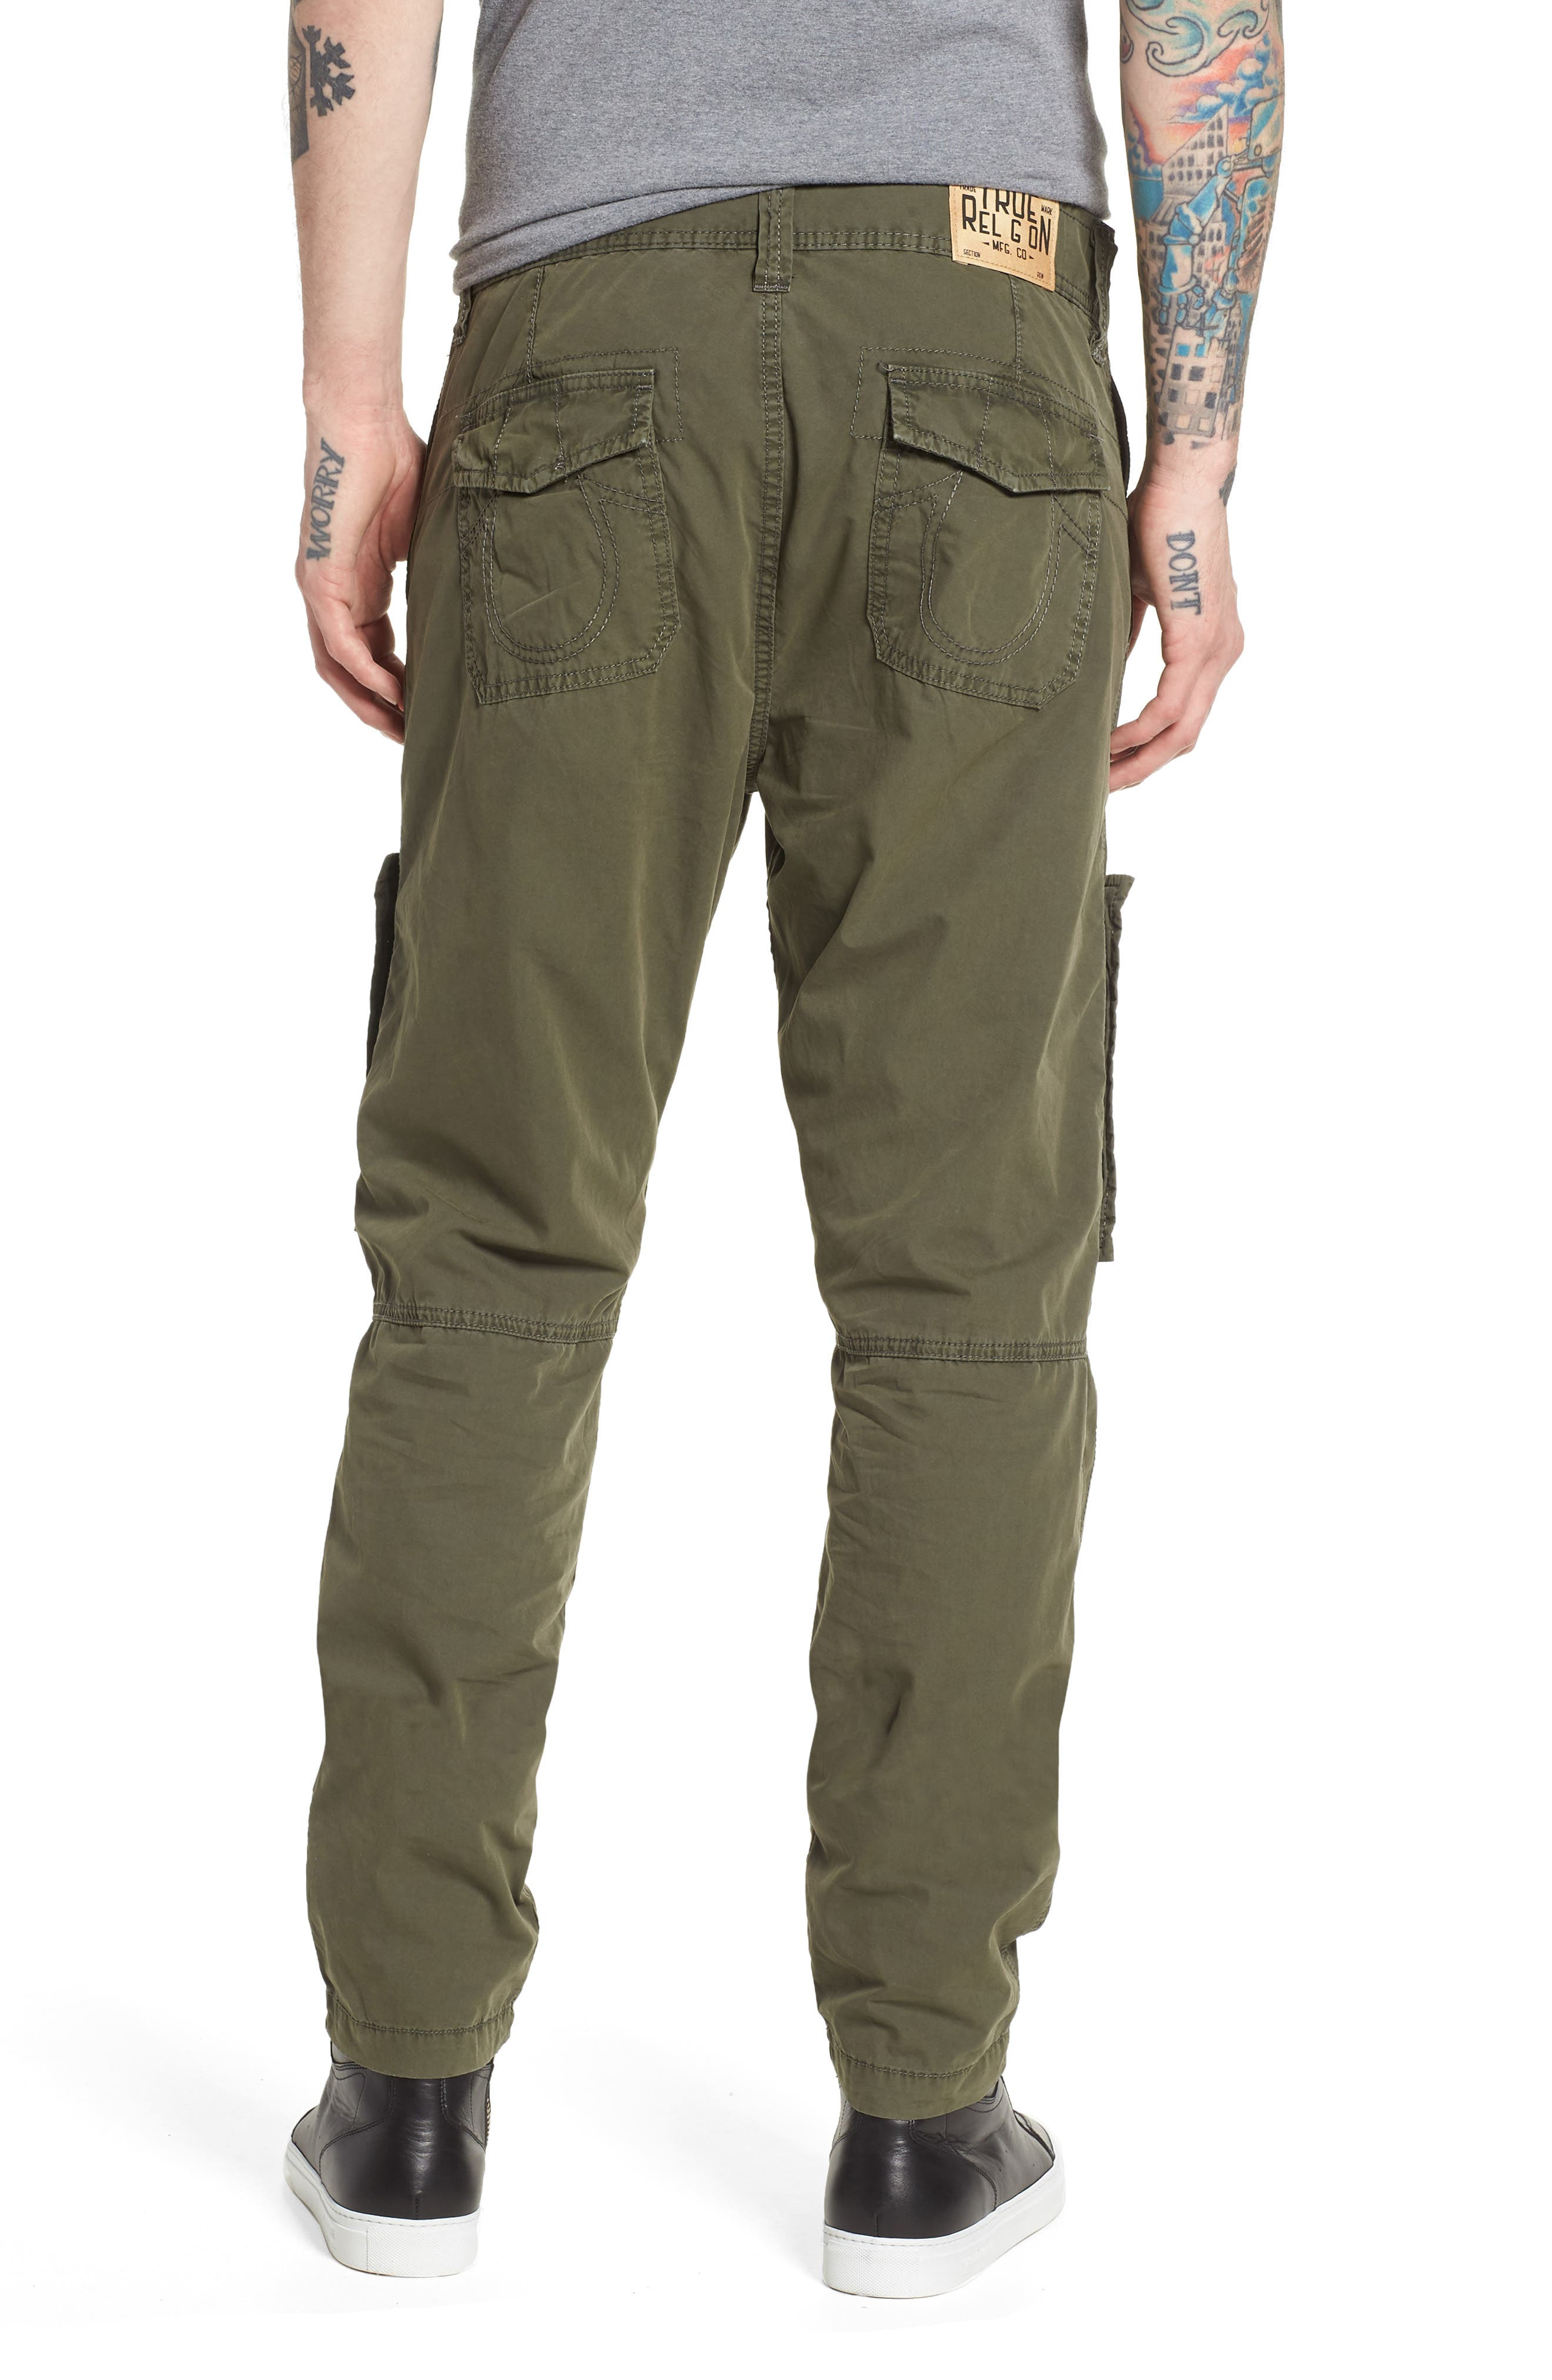 Officer Field Pants,                             Alternate thumbnail 3, color,                             Epj Militant Green